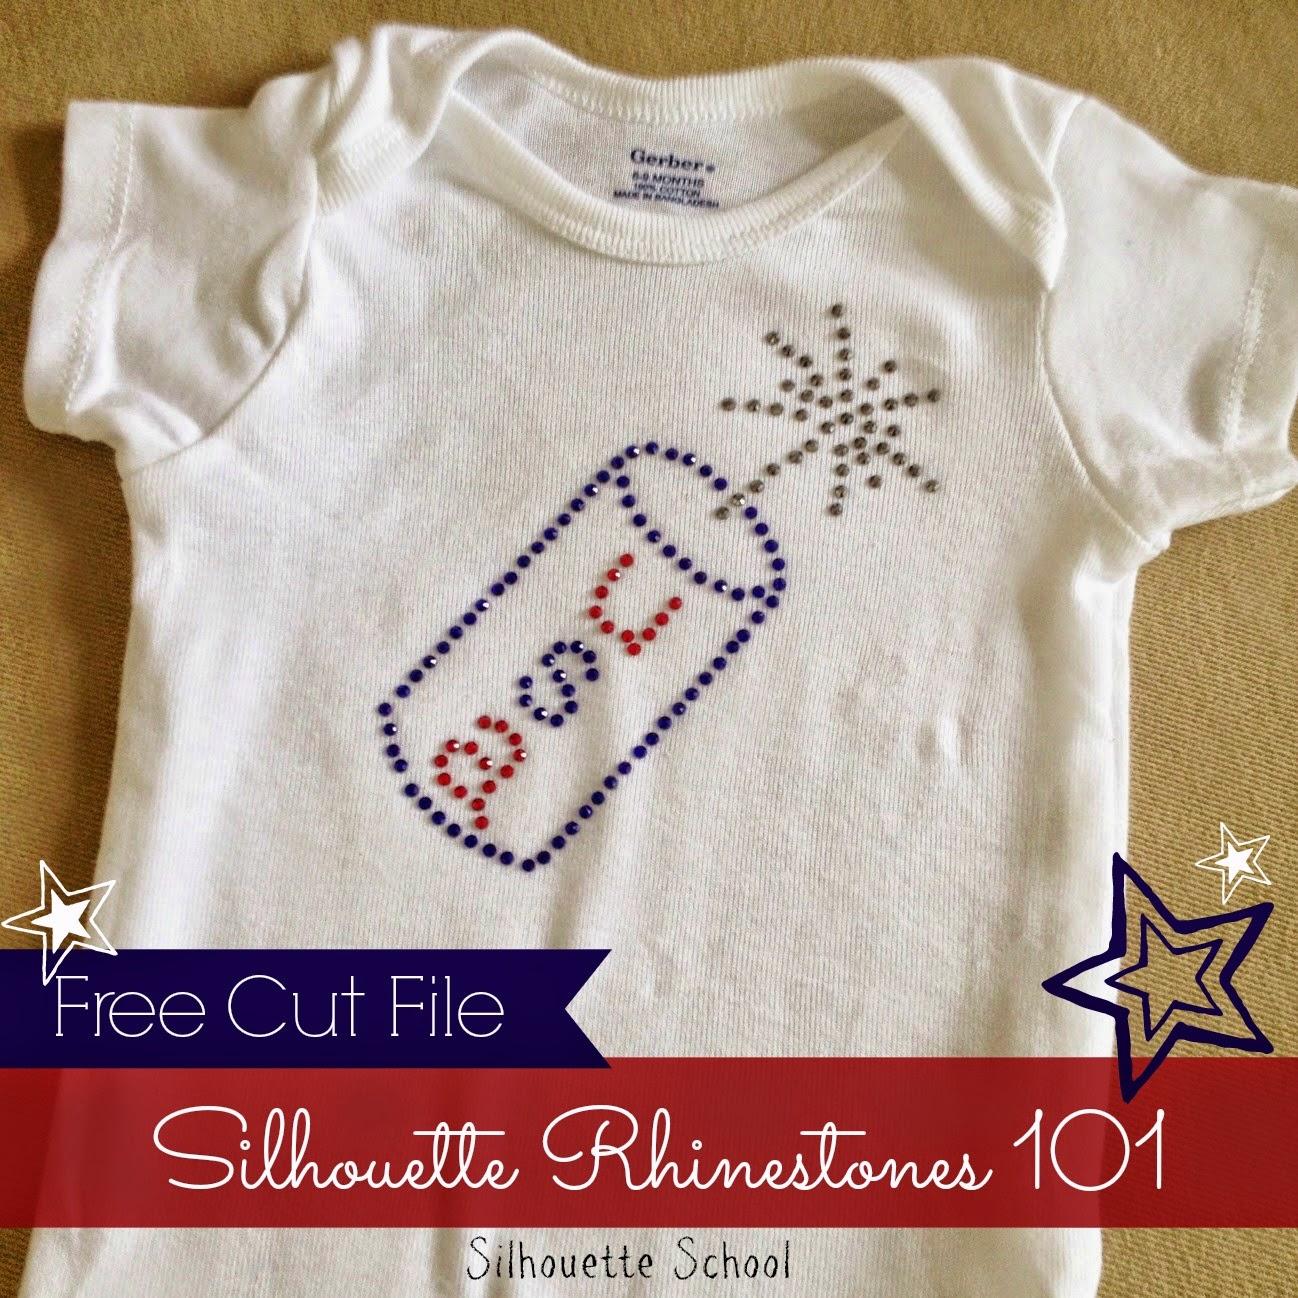 Shirt design needed - Rhinestone Silhouette Beginner 101 Tutorial Designer Edition Not Needed